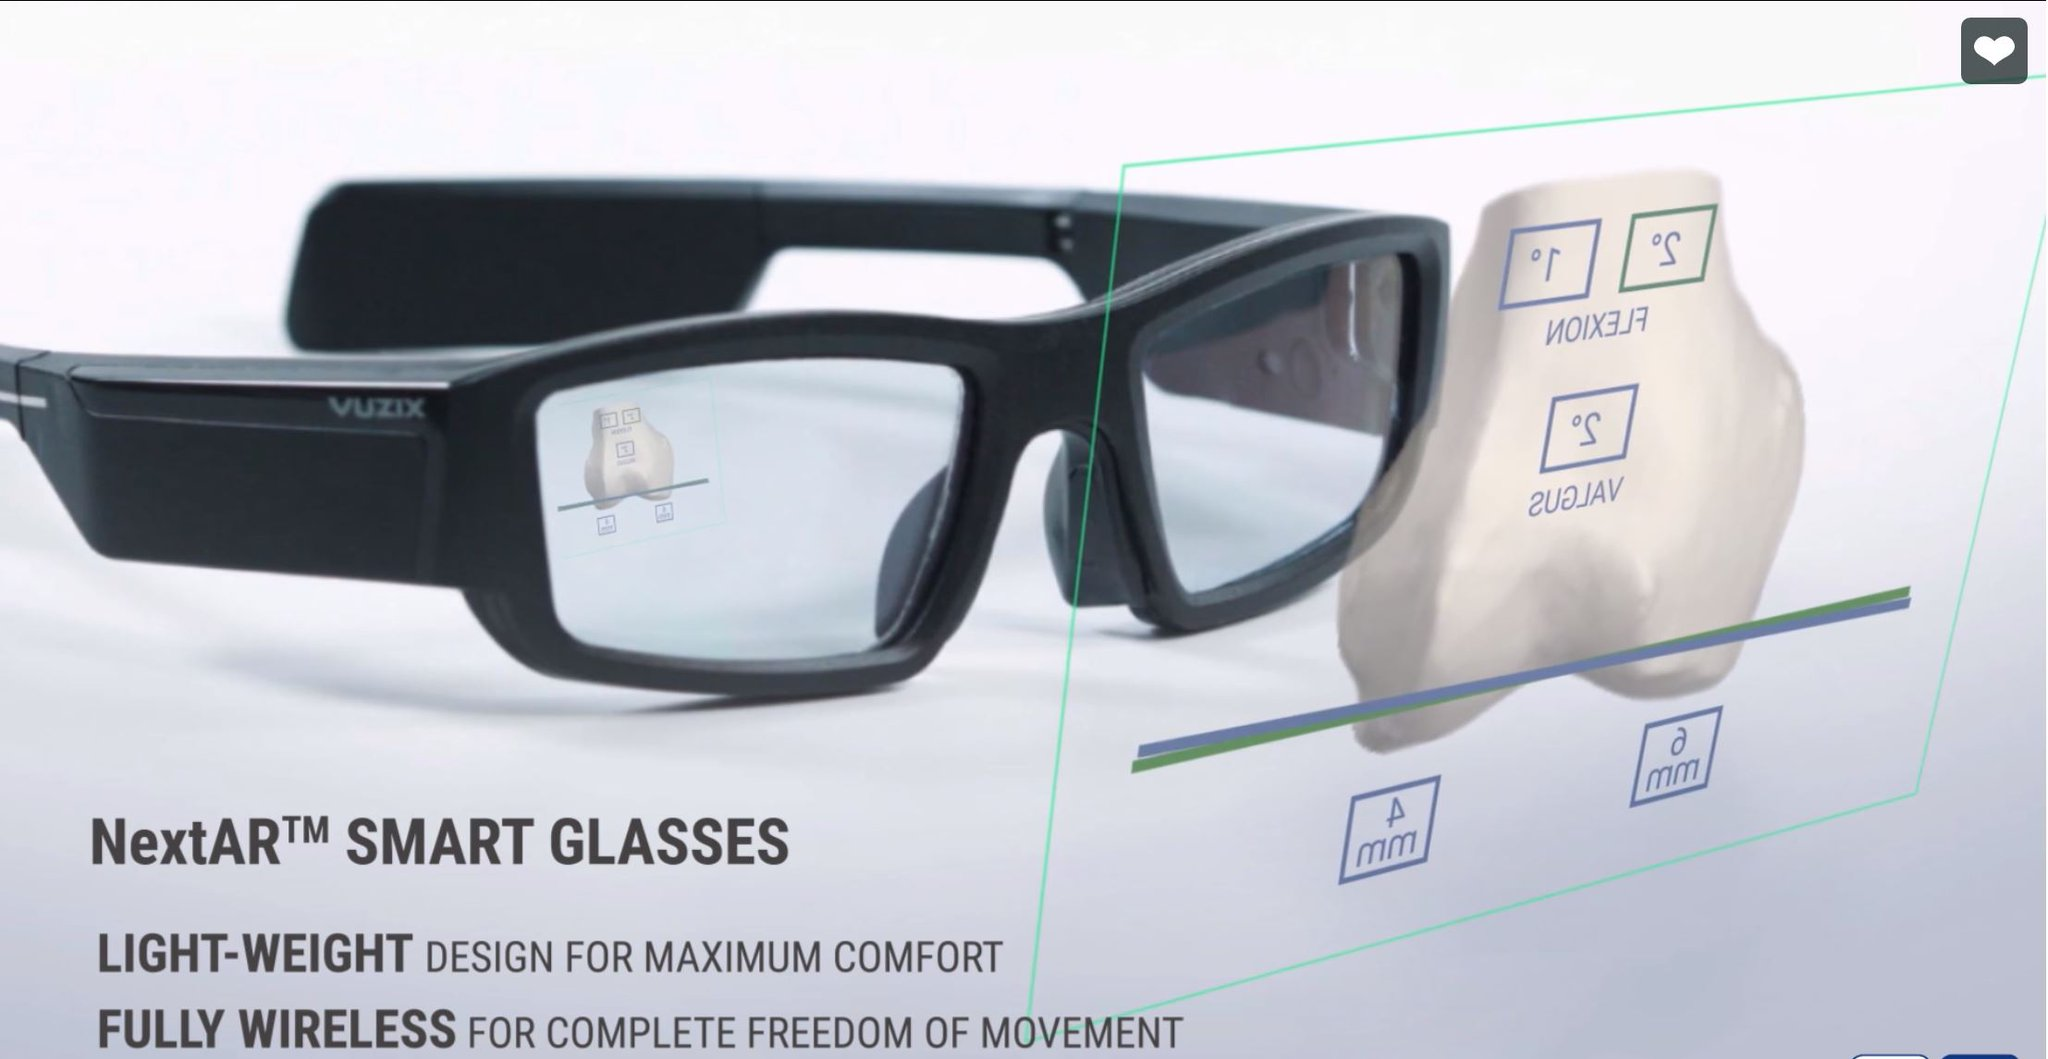 "Vuzix on Twitter: ""#VuzixBlade Smart Glasses featured by @medacta in their  NextAR(TM) augmented reality surgery platform video https://t.co/kUAQ8yBdEg  #NextAR #TotalKneeReplacement #Medacta #KneeSurgery #AR #healthcare $VUZI…  https://t.co/1rCUQK6m6l"""